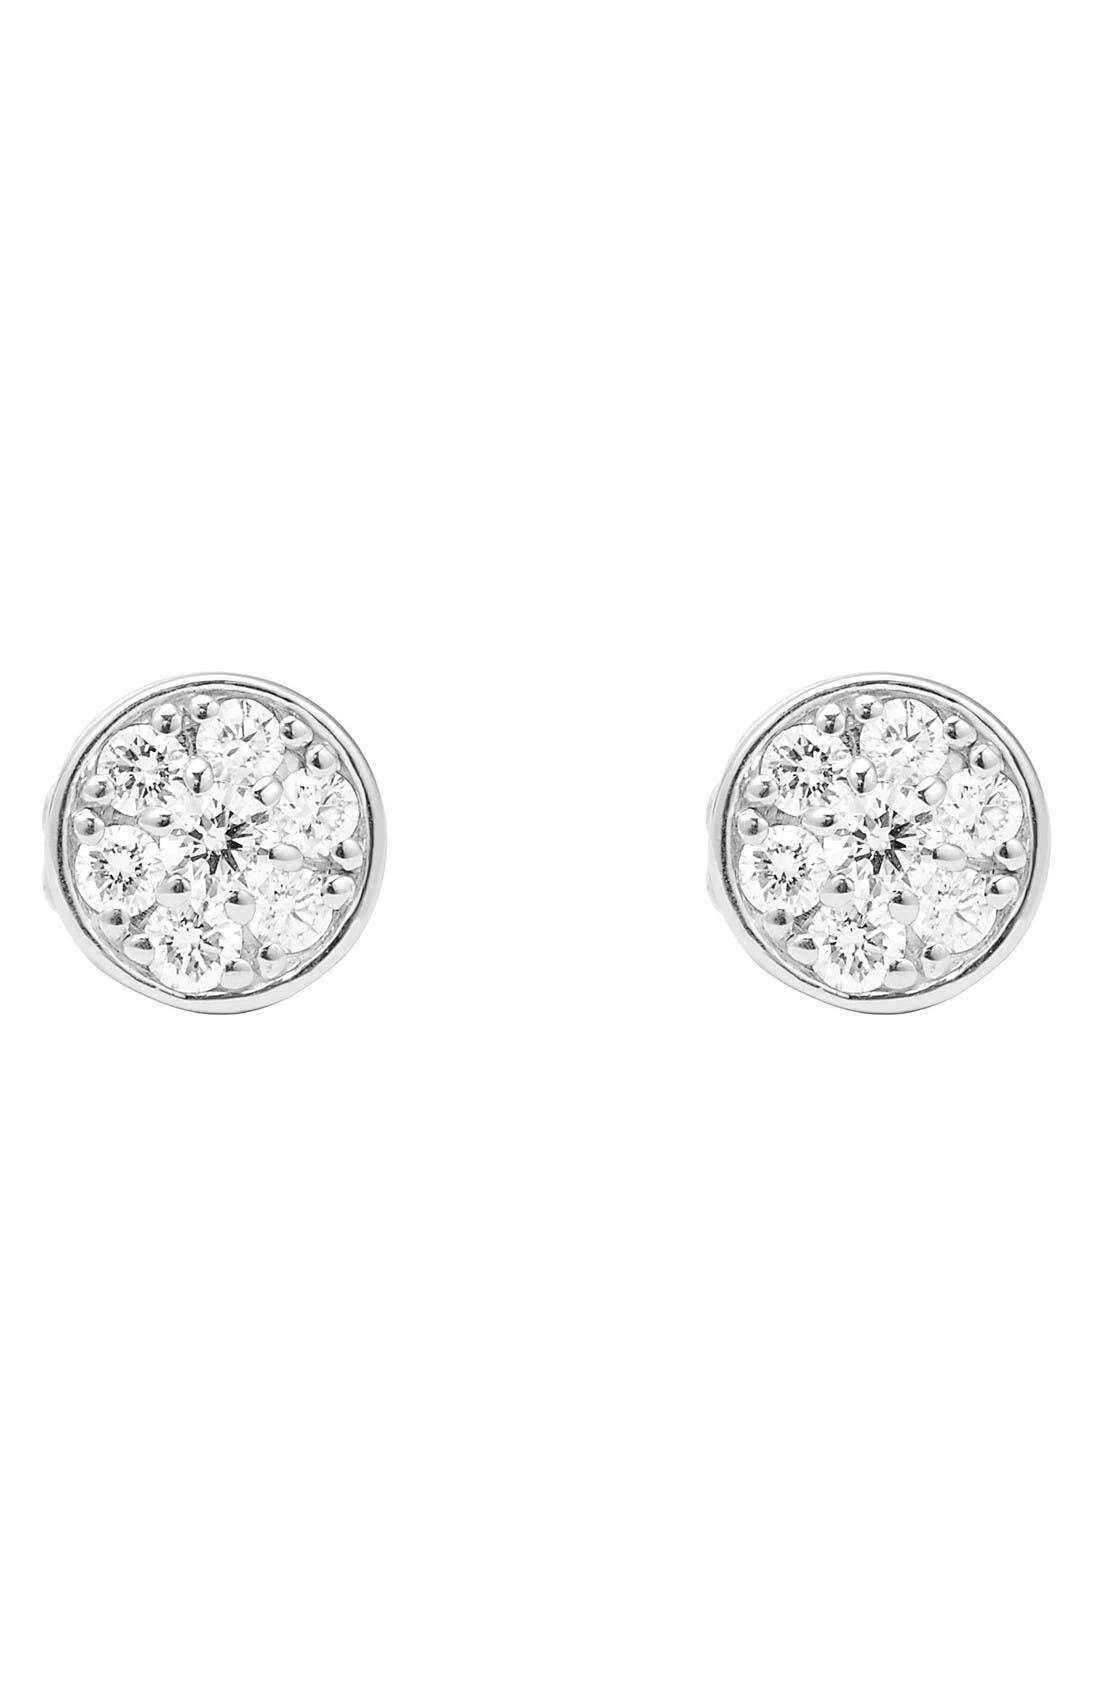 Diamond & Caviar Stud Earrings,                             Alternate thumbnail 2, color,                             Silver/ Gold